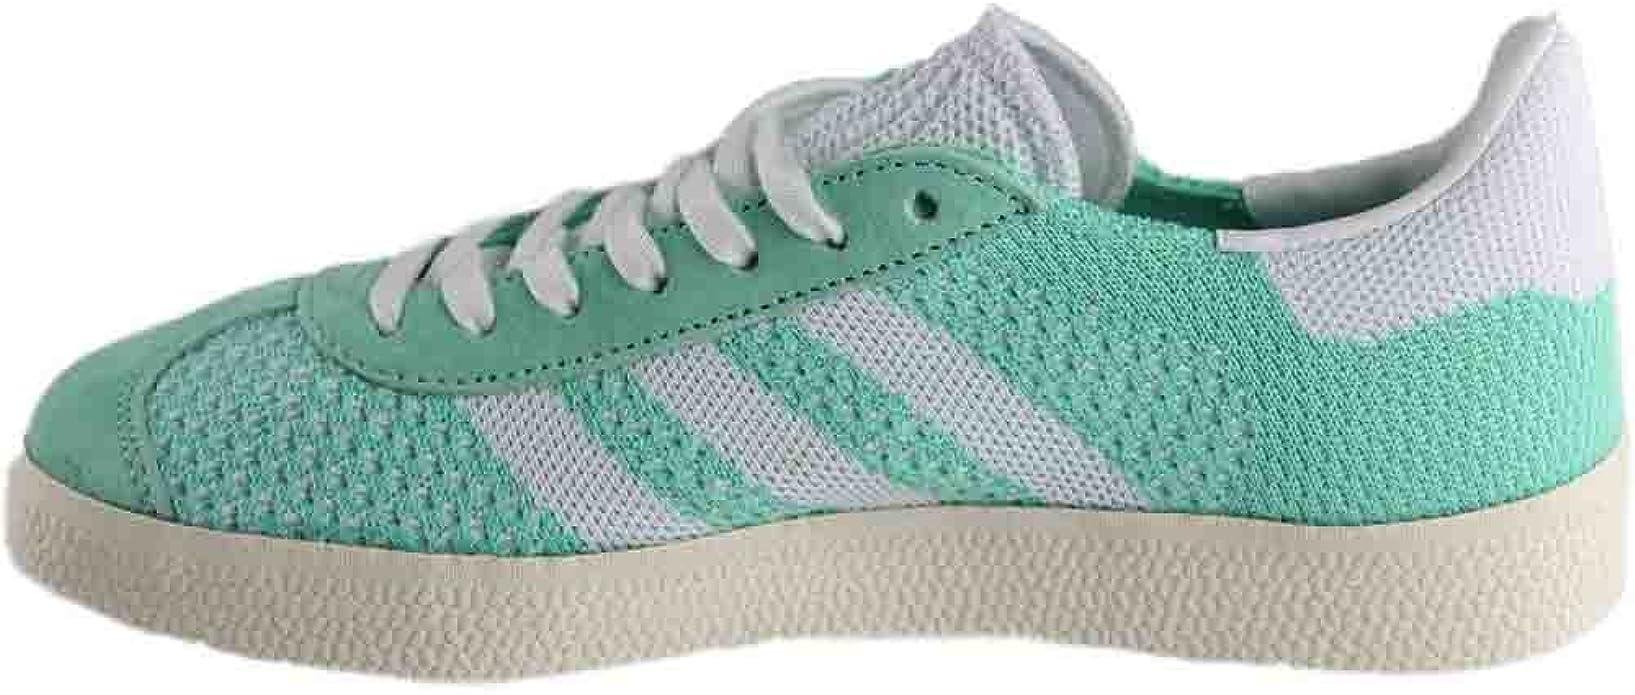 adidas Gazelle Easy Green WMNS BB5210 US Women Size 6